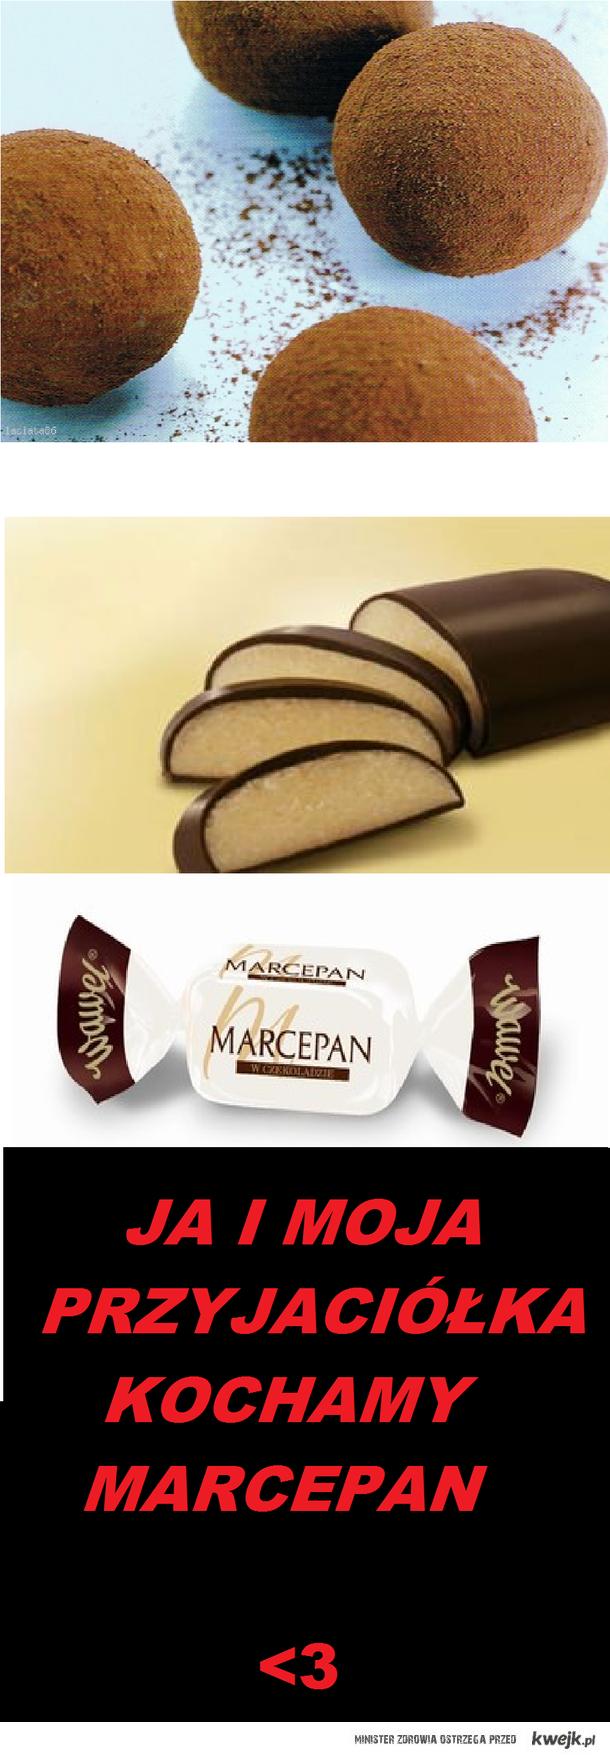 Marcepan <3